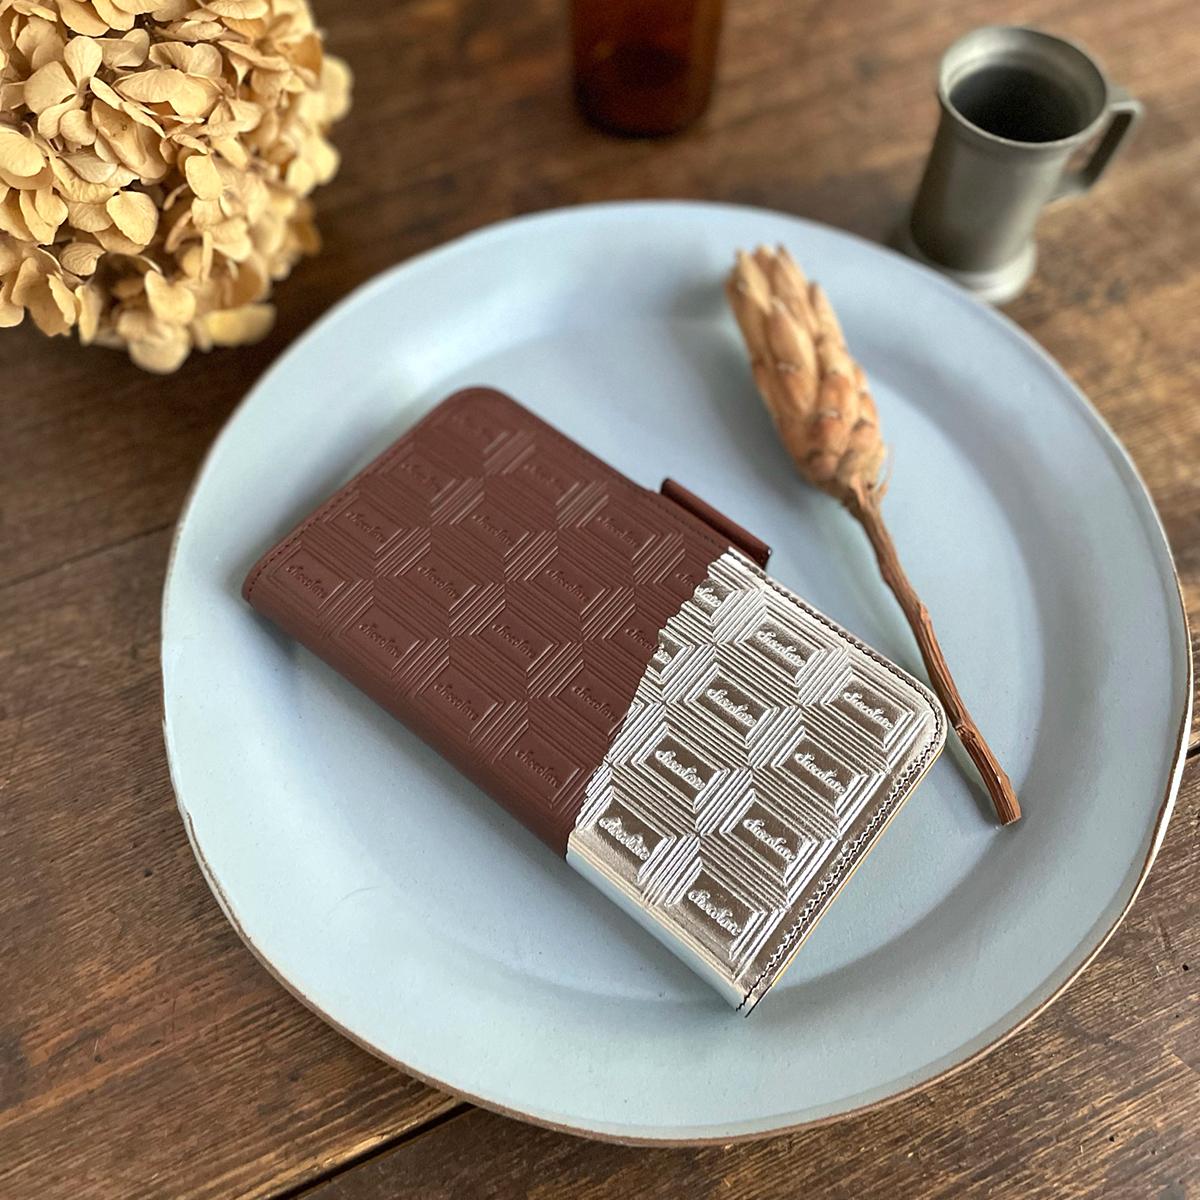 Mサイズ:革のチョコ手帳型スマホケース スイート(銀の包み紙)